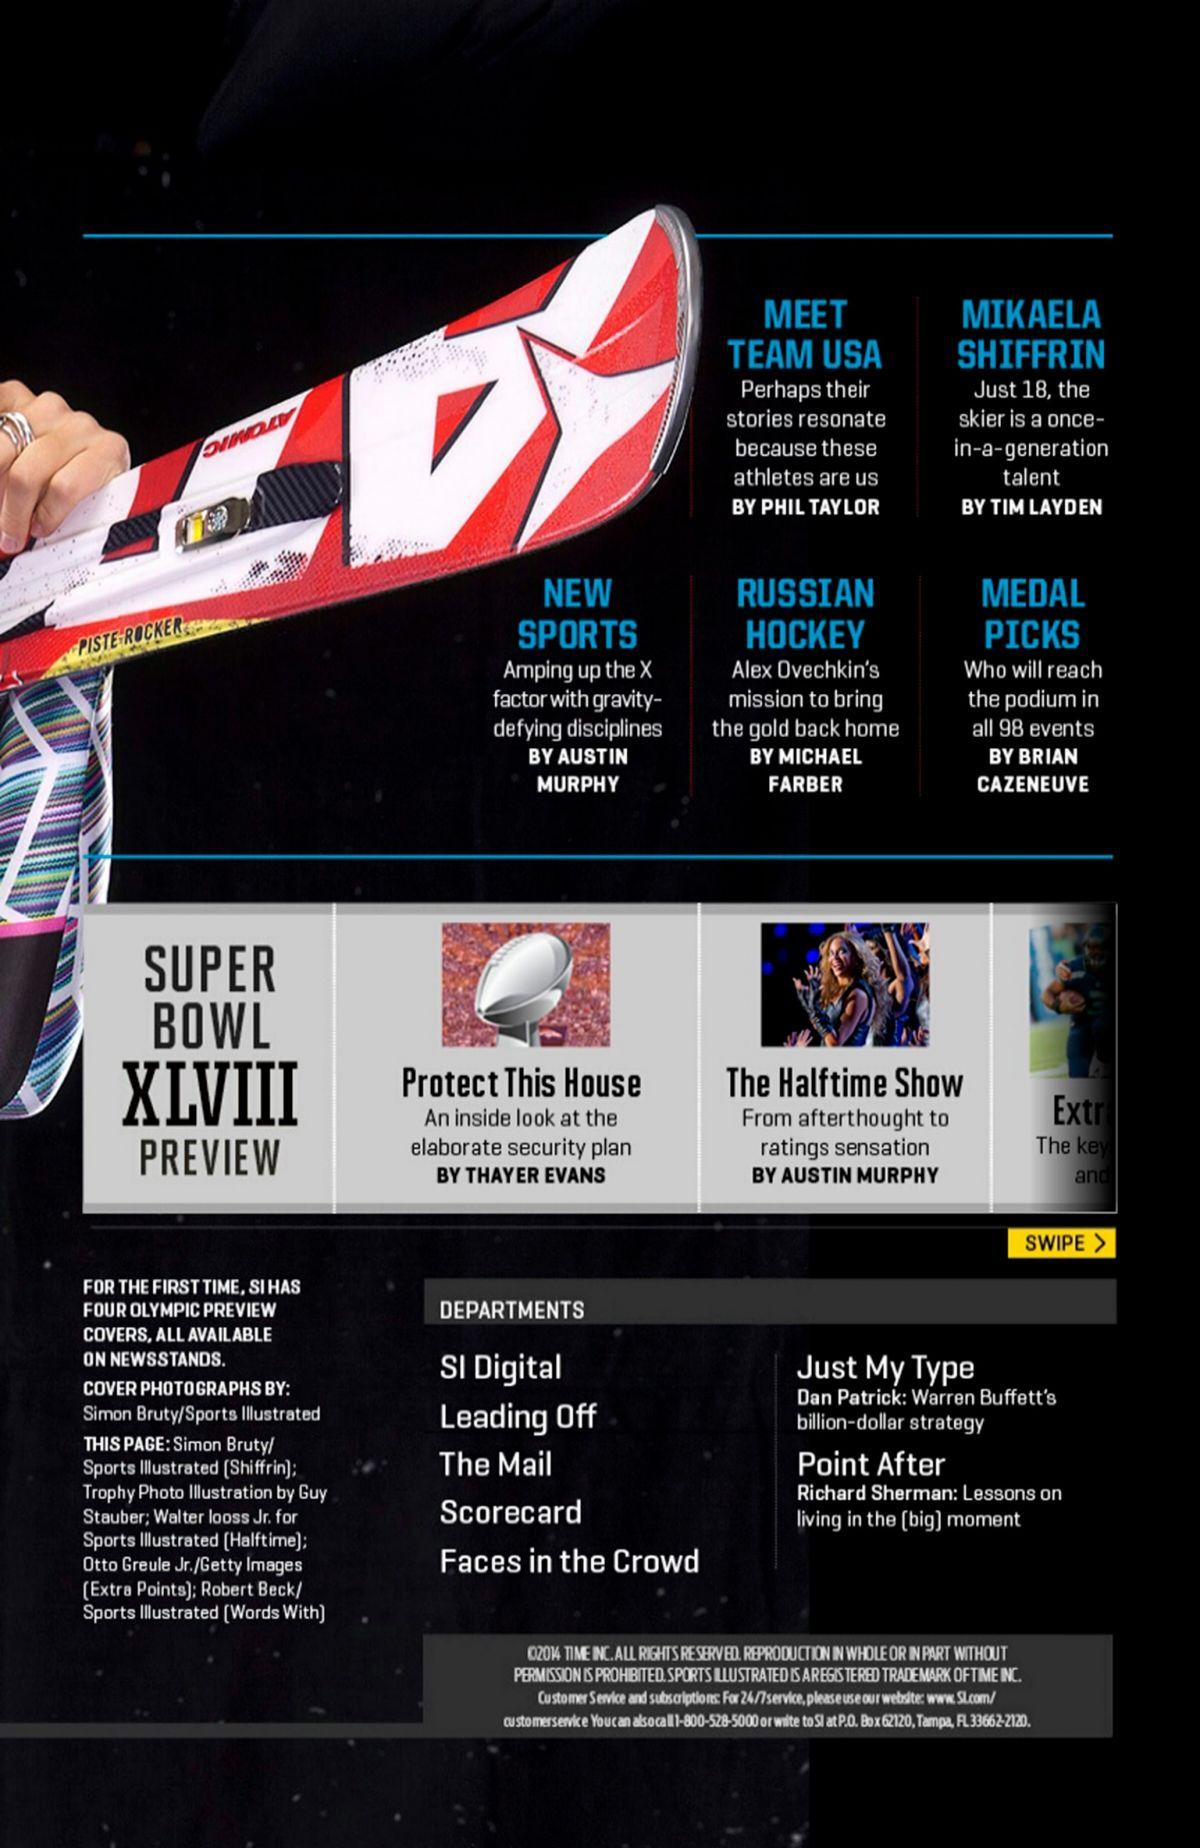 Mikaela Shiffrin Sports Illustrated Magaznie February